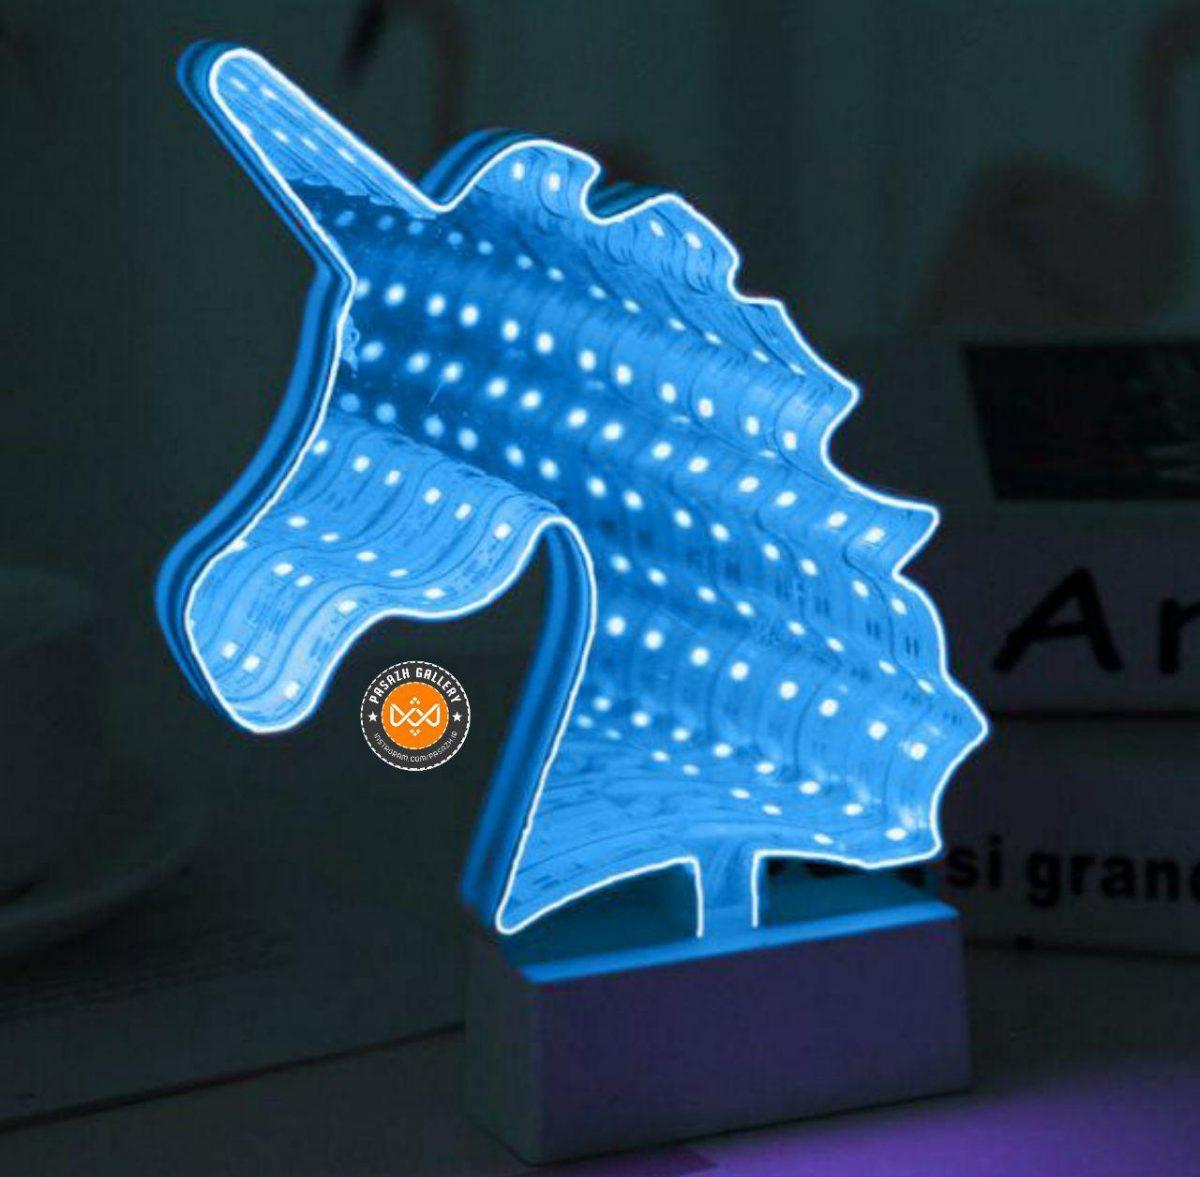 unicorn-bedside lamp-pasazh-product